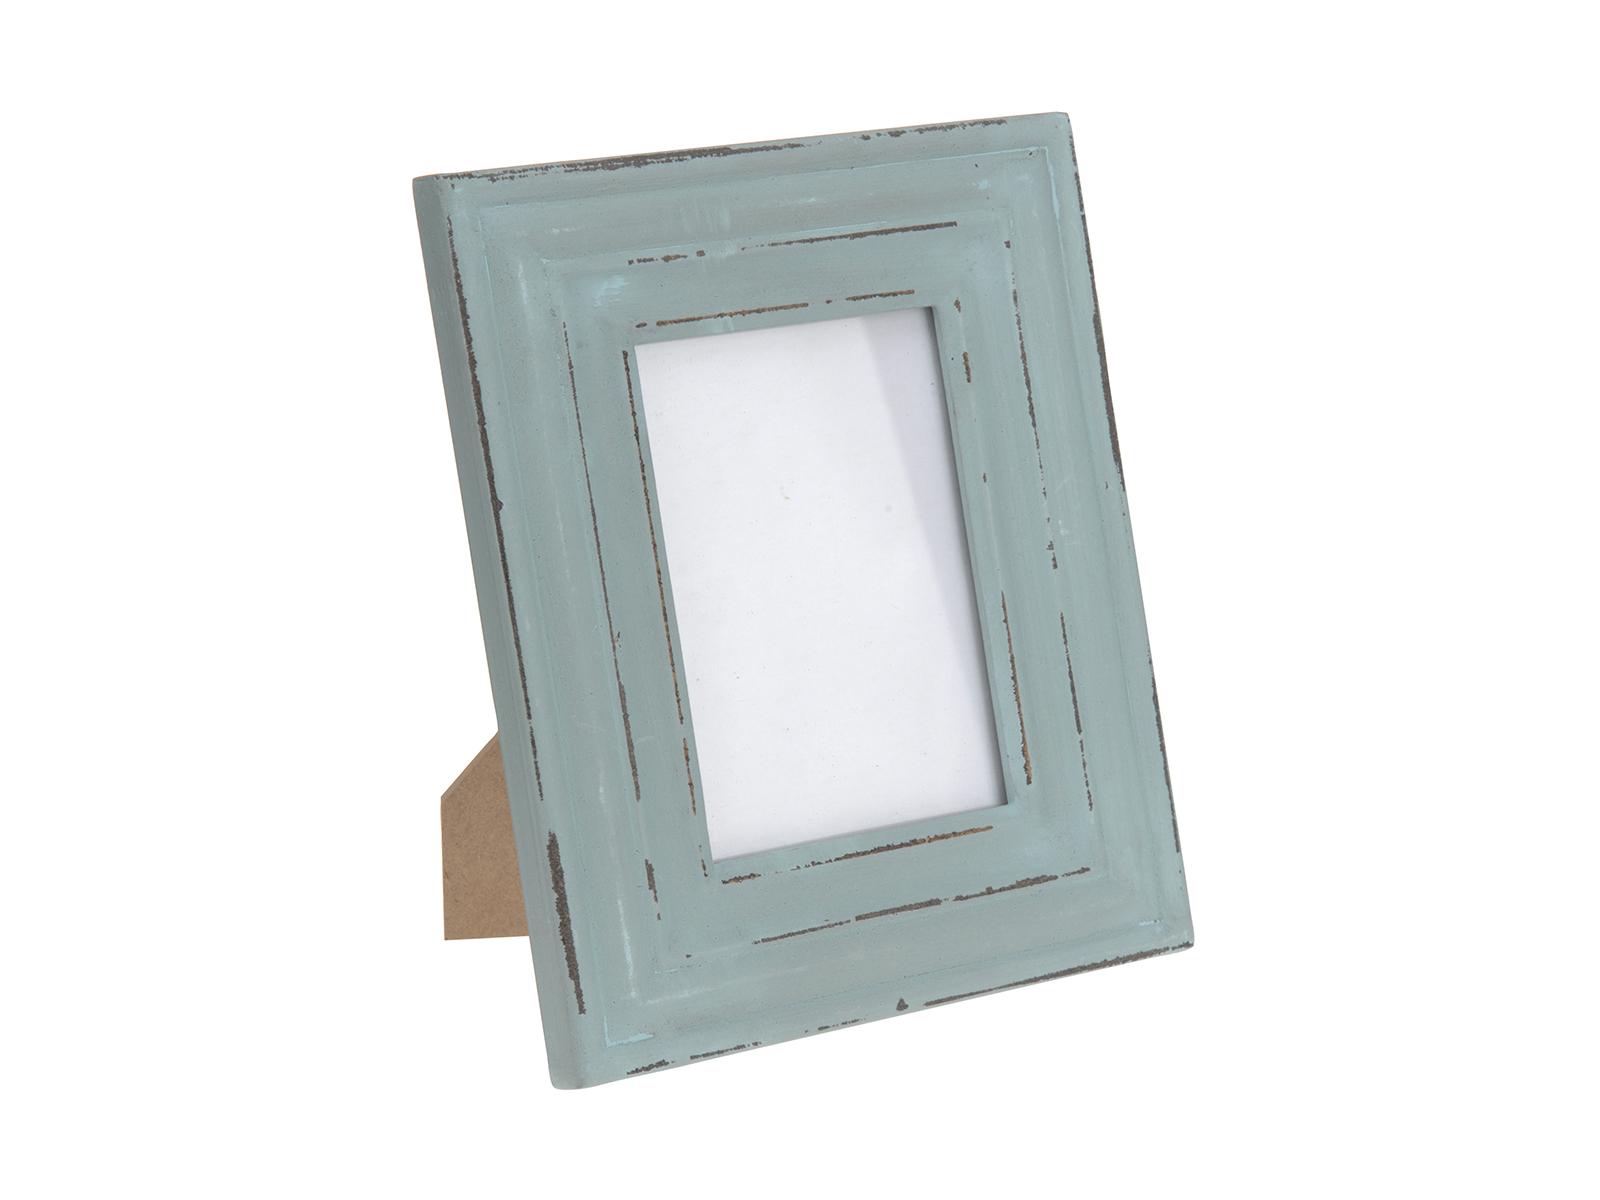 Фоторамка Old WoodФоторамки<br>Деревянная рамка для фотографий с подставкой<br>